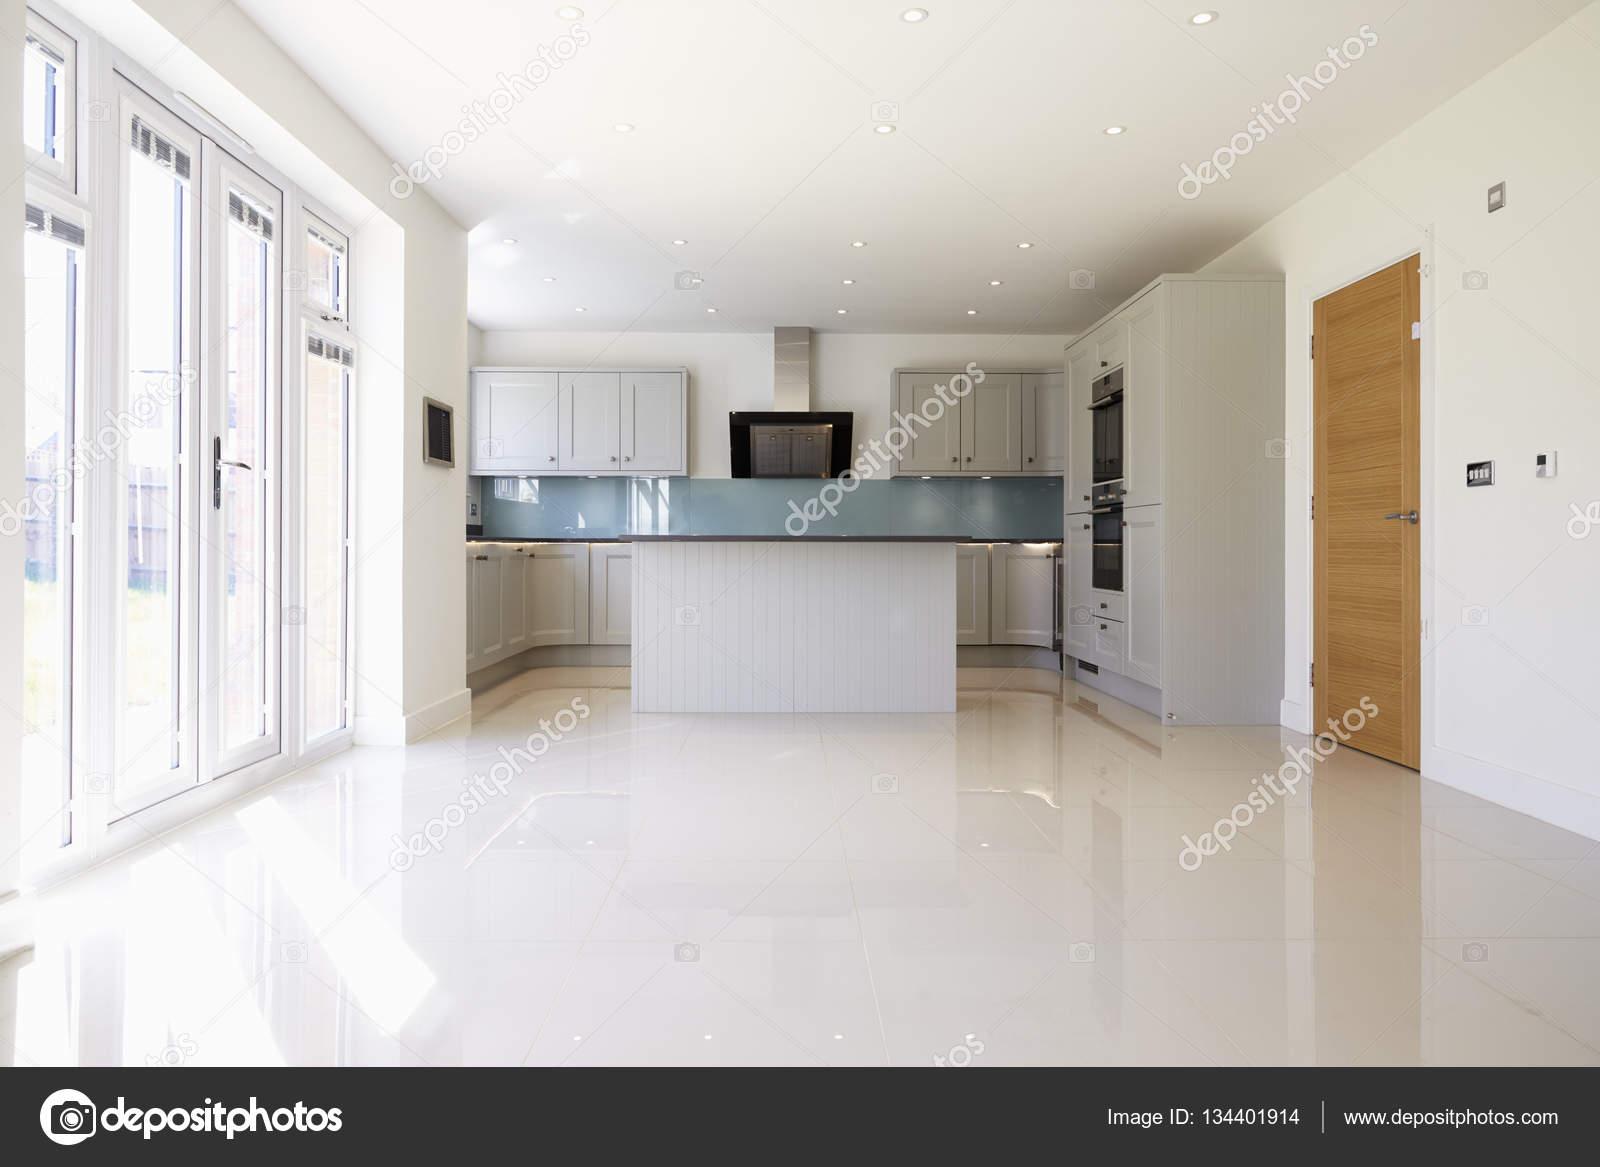 Cozinha Vazia Em Casa Moderna Stock Photo Monkeybusiness 134401914